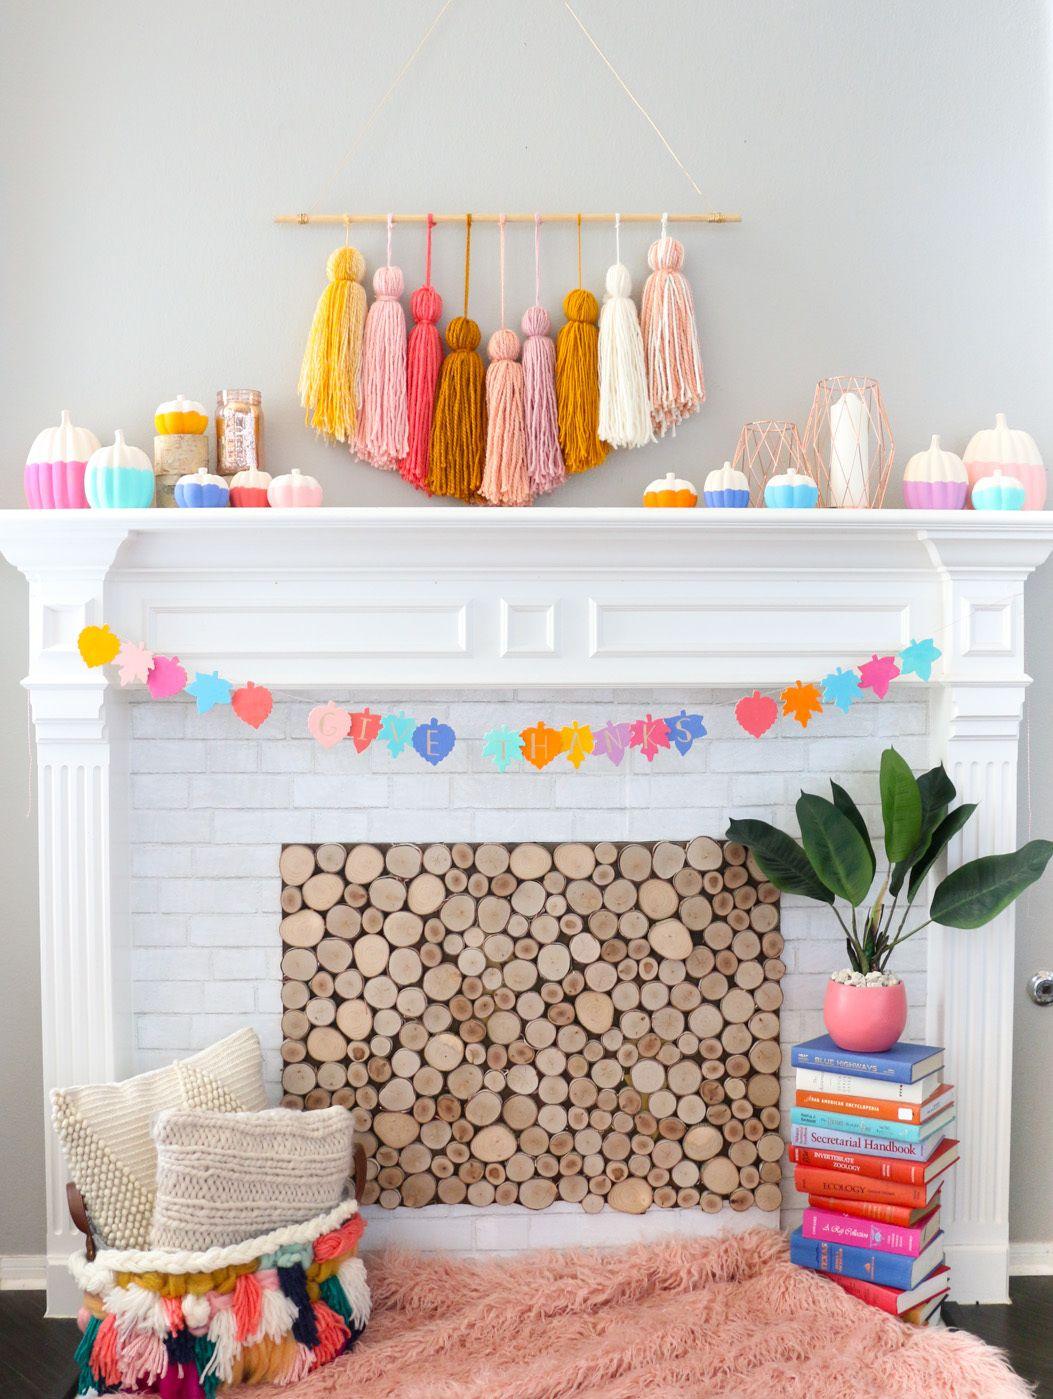 Fun365 Craft Party Wedding Classroom Ideas Inspiration Decor Crafts Decor Handmade Home Decor